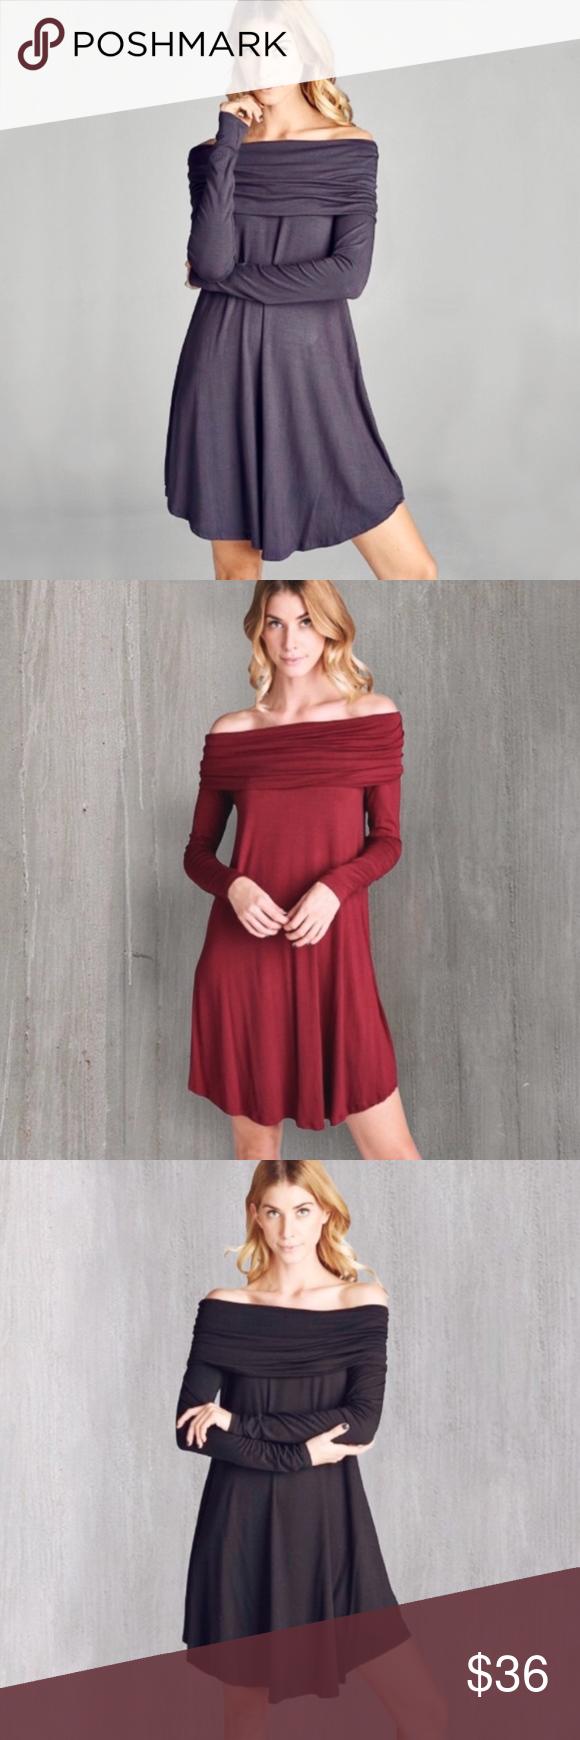 Off the shoulder steel grey trapeze dress red black sleeved dress